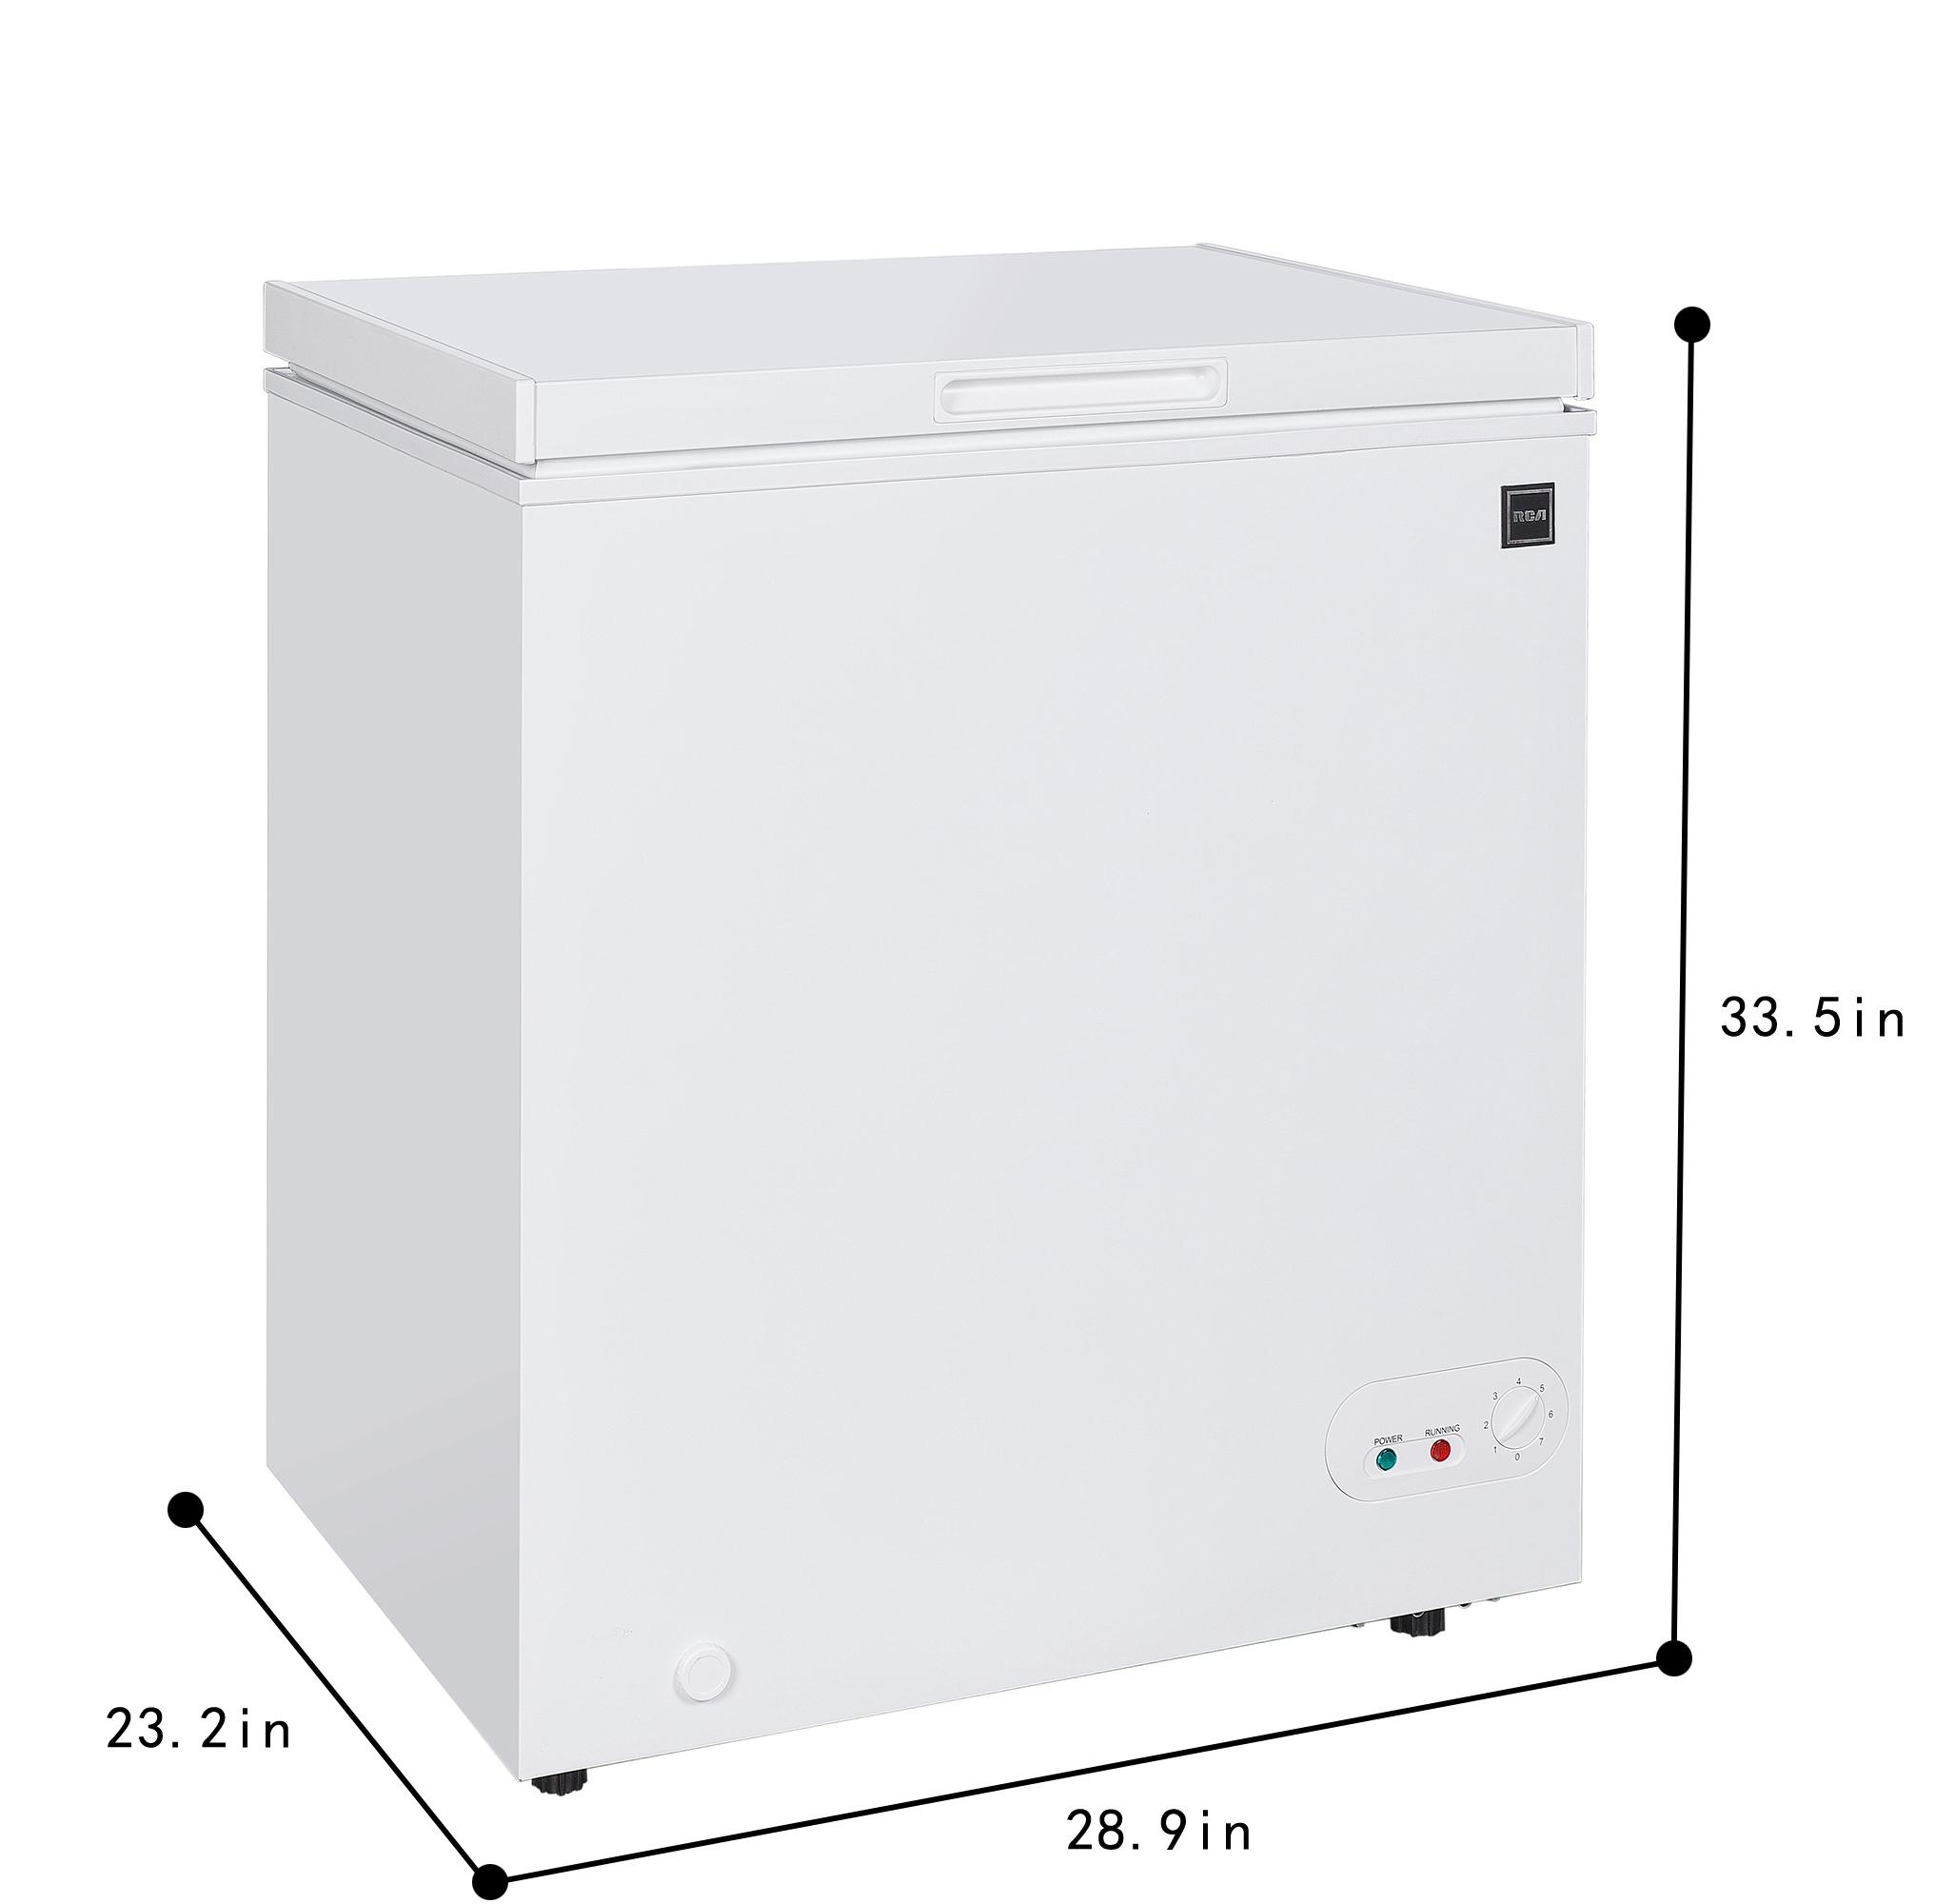 Freezer2